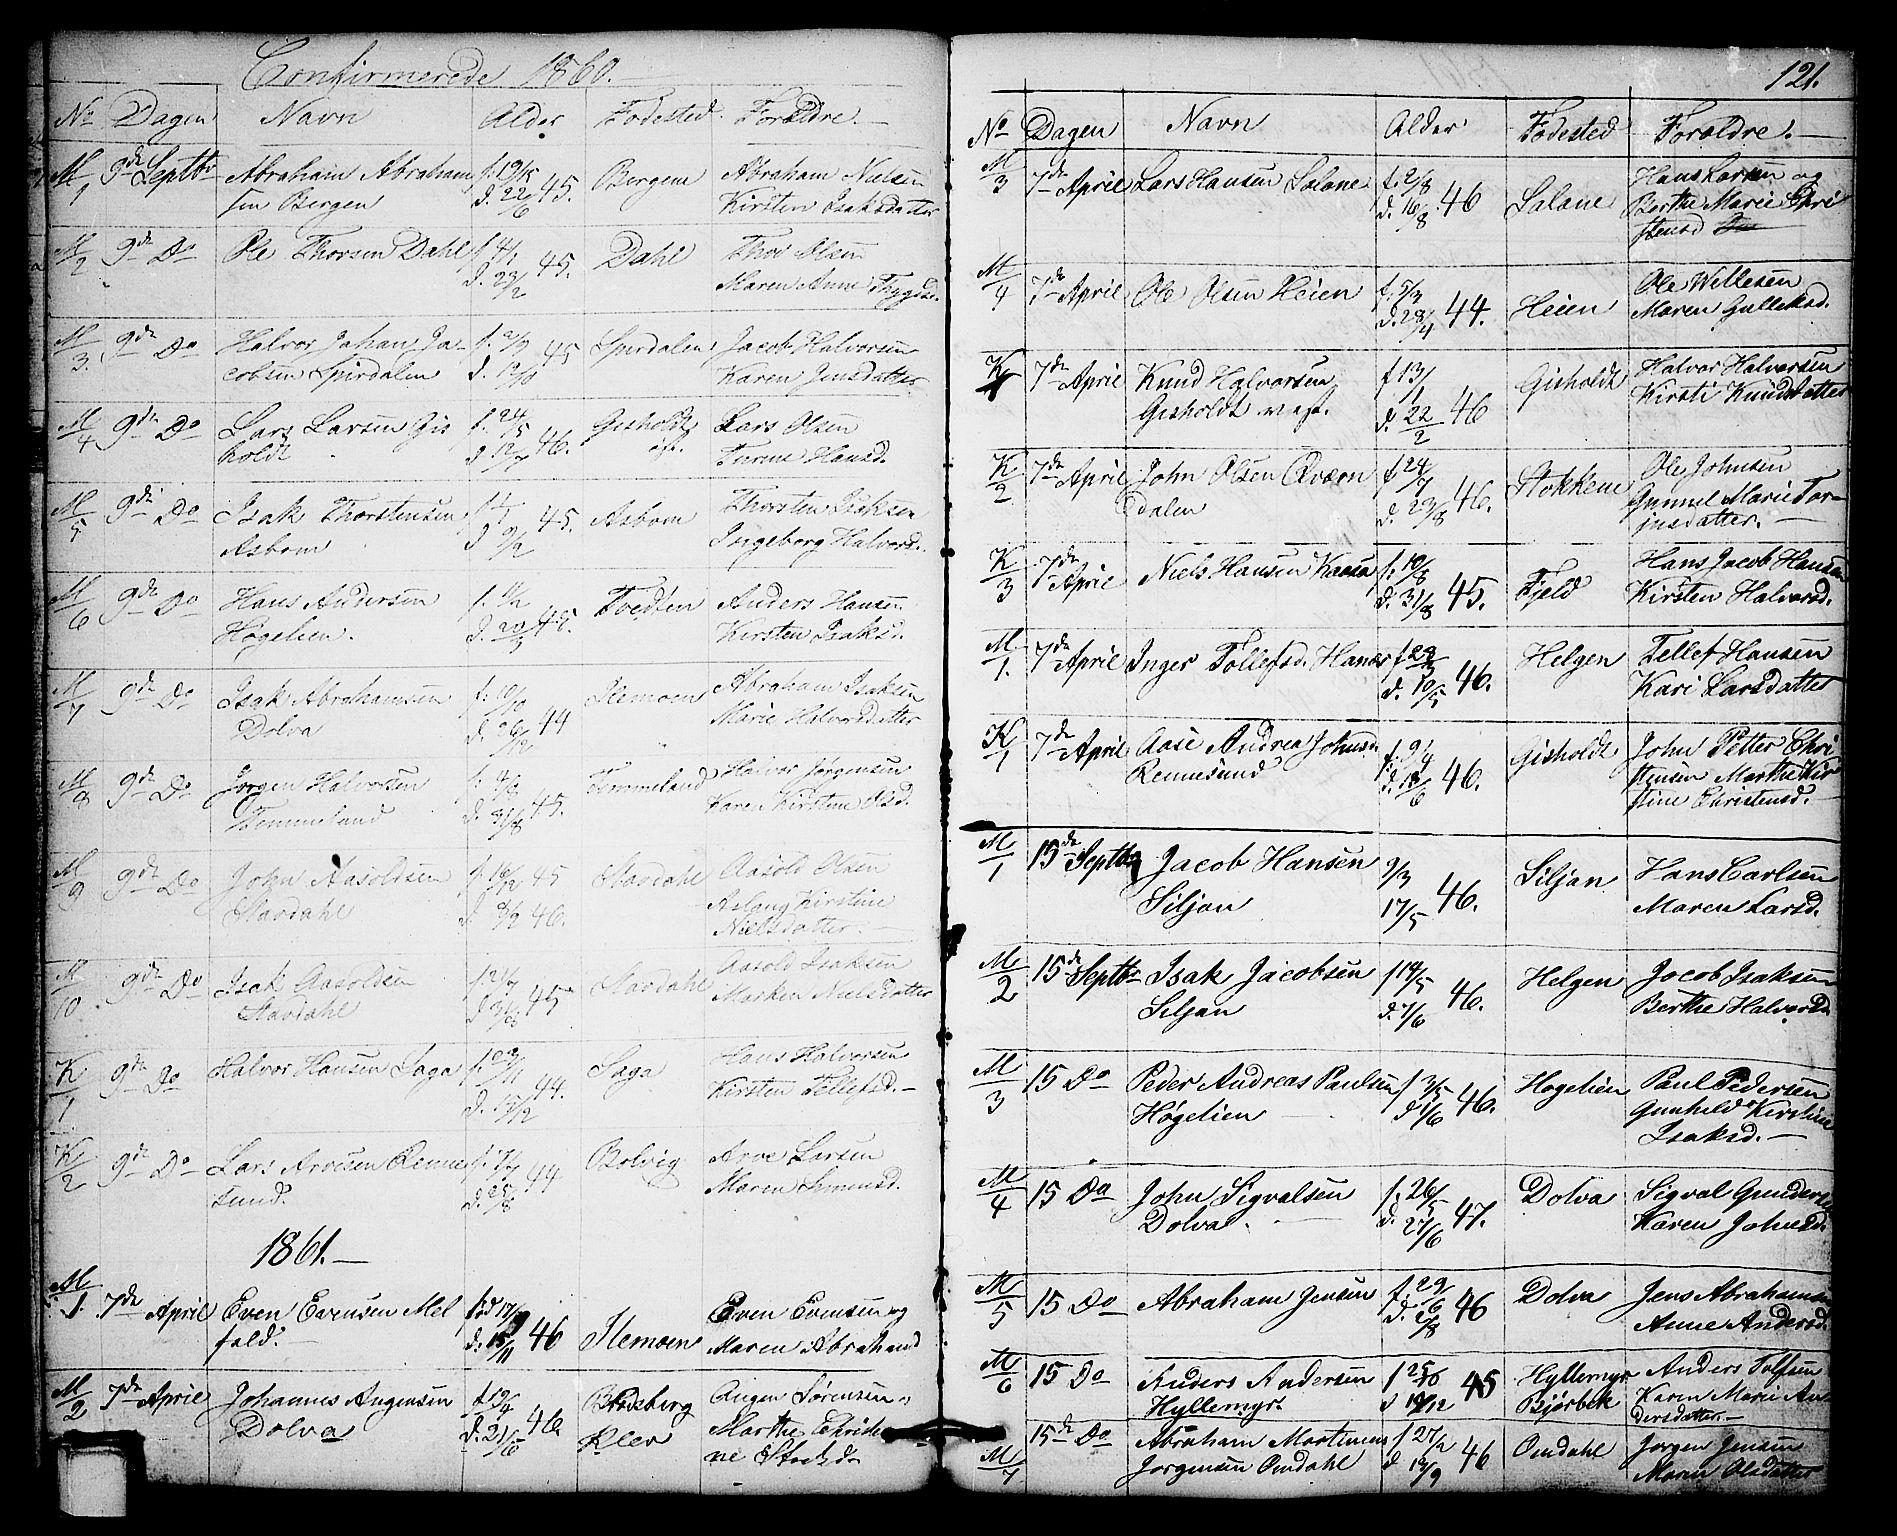 SAKO, Solum kirkebøker, G/Gb/L0002: Klokkerbok nr. II 2, 1859-1879, s. 121